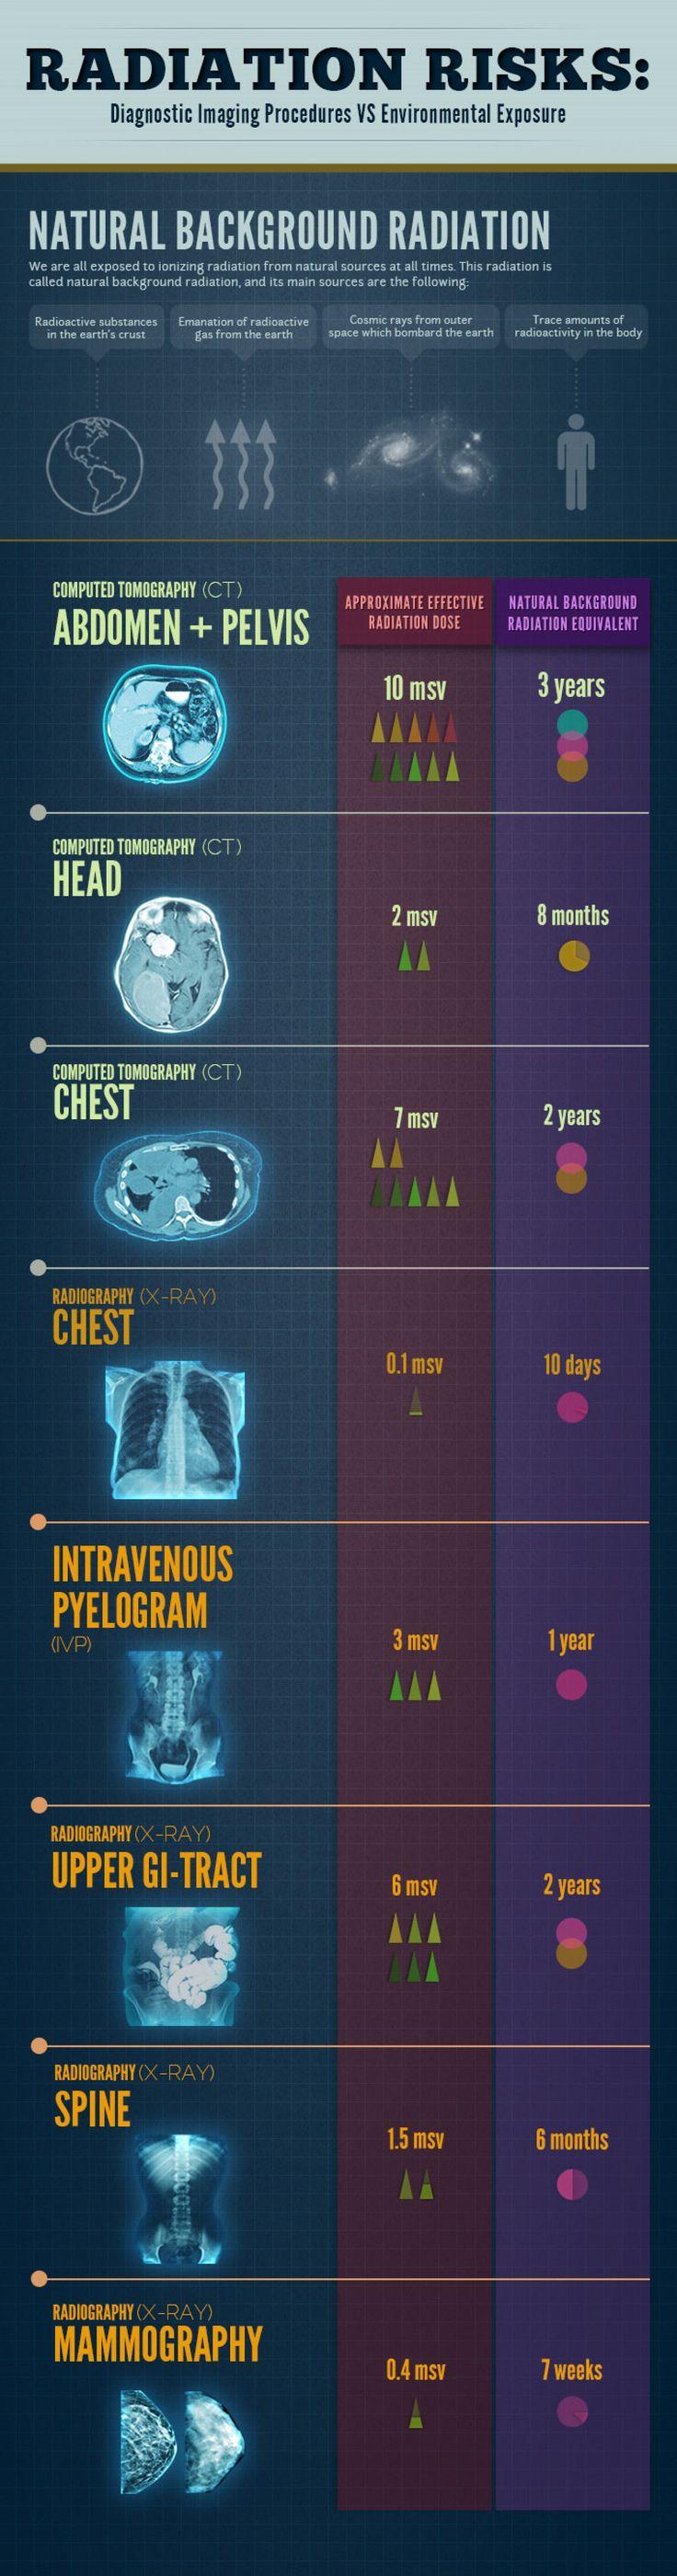 Radiation Risks: Diagnostic Imaging Procedures VS Environmental Exposure Infographic